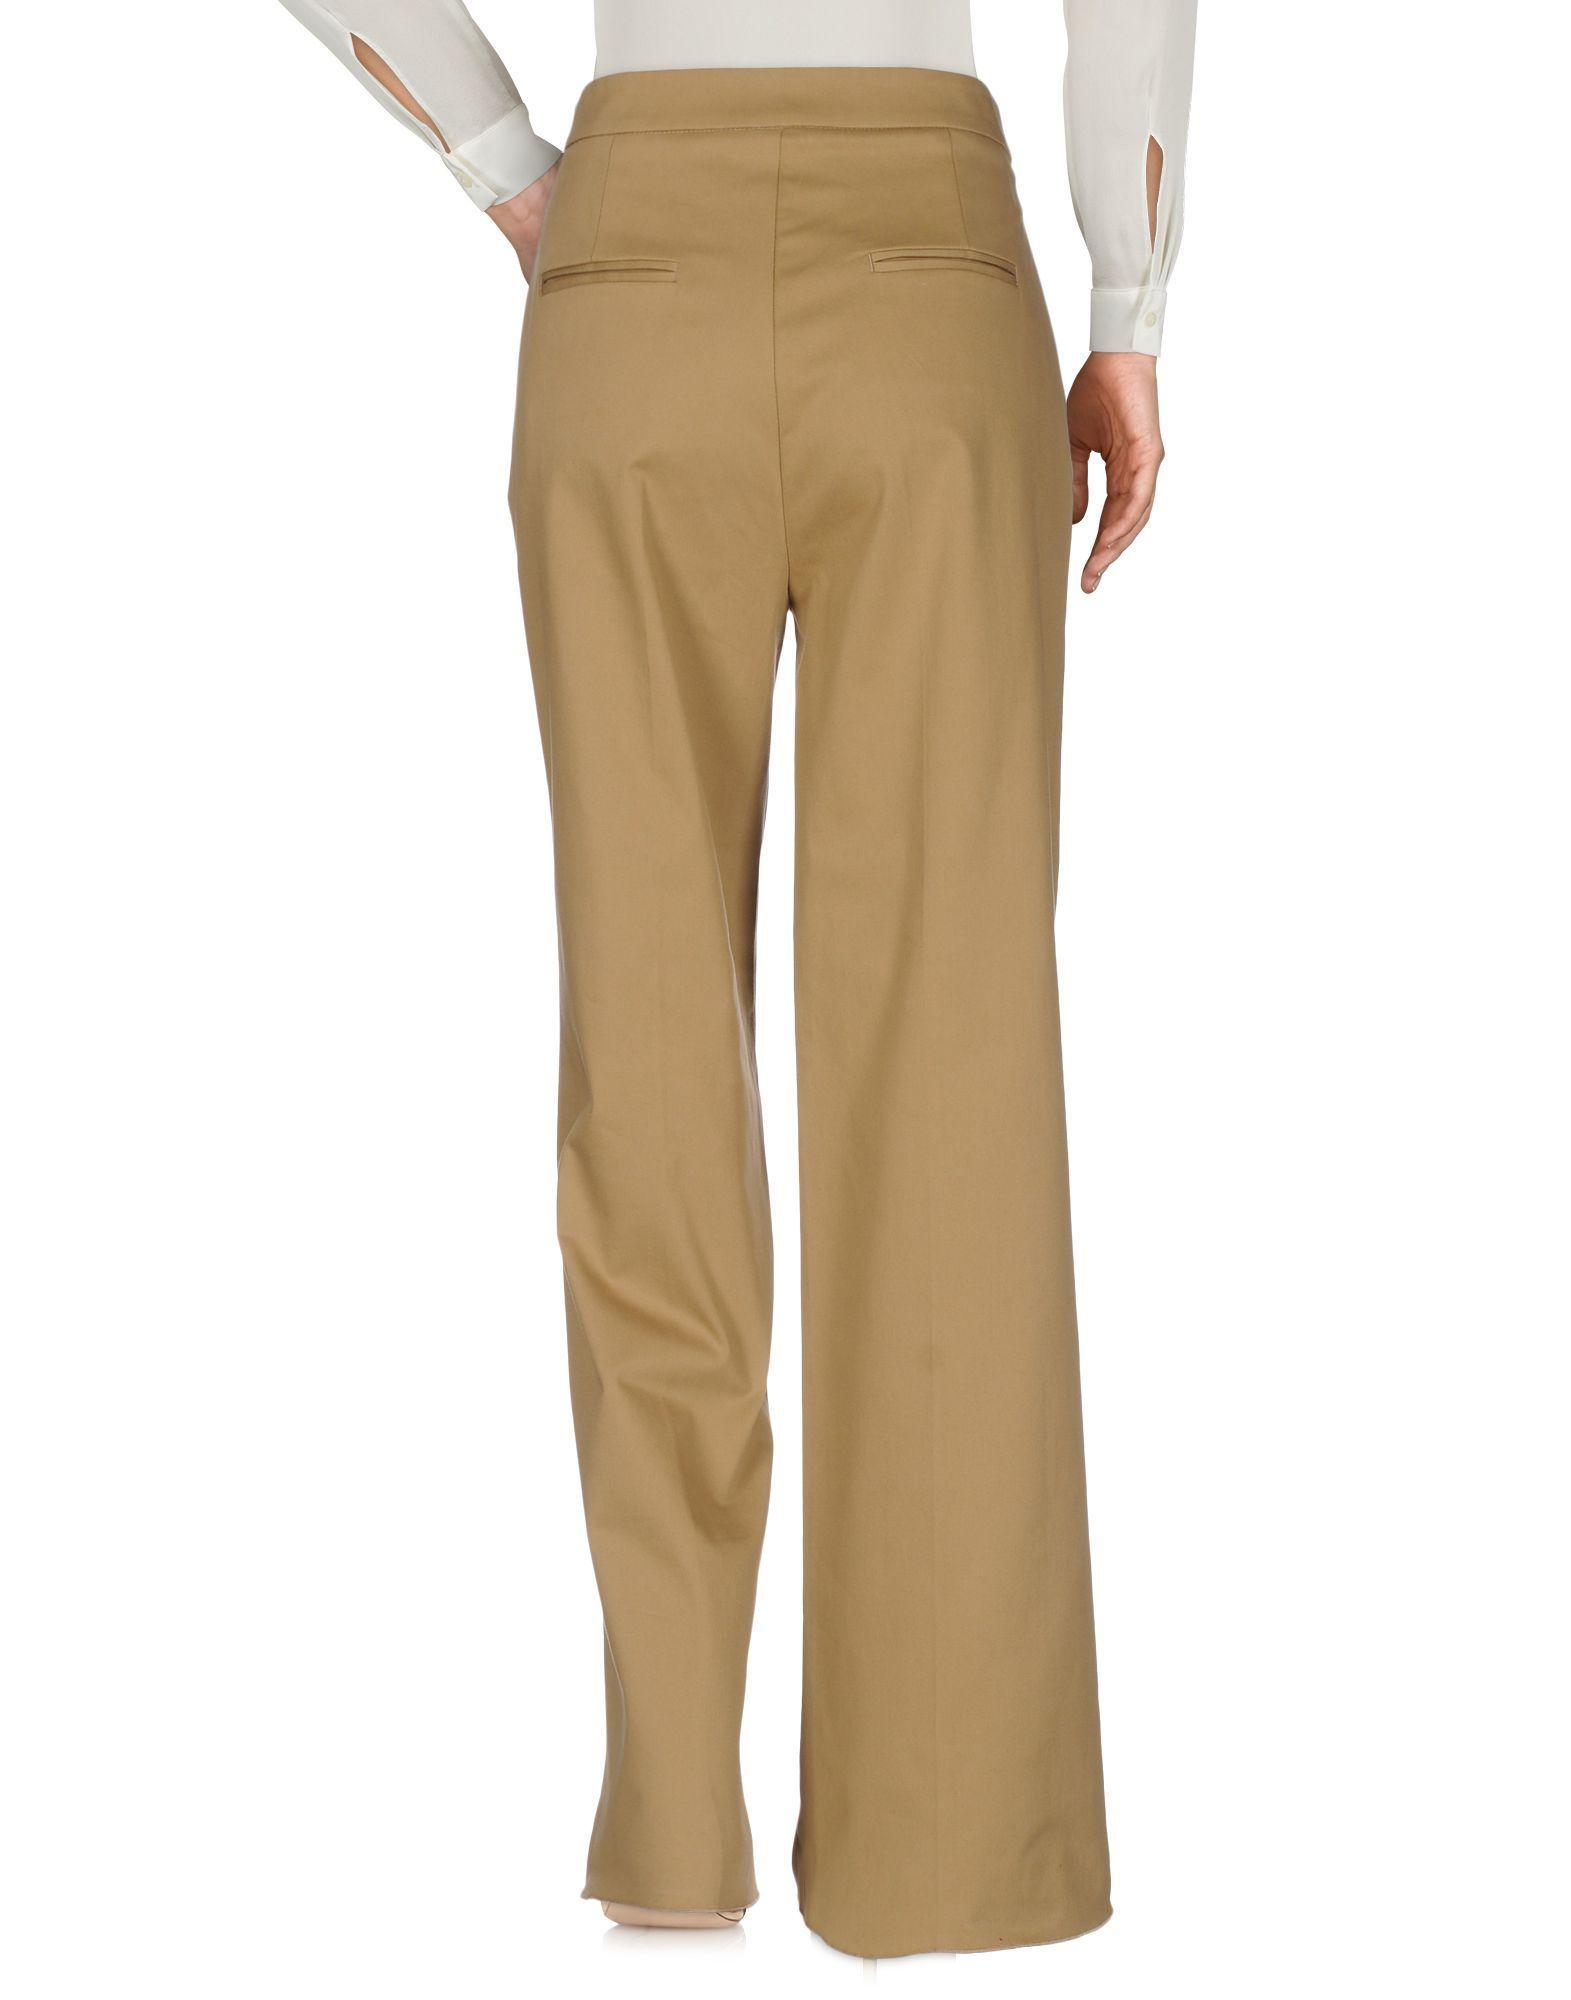 Trousers Aglini Khaki Women's Cotton